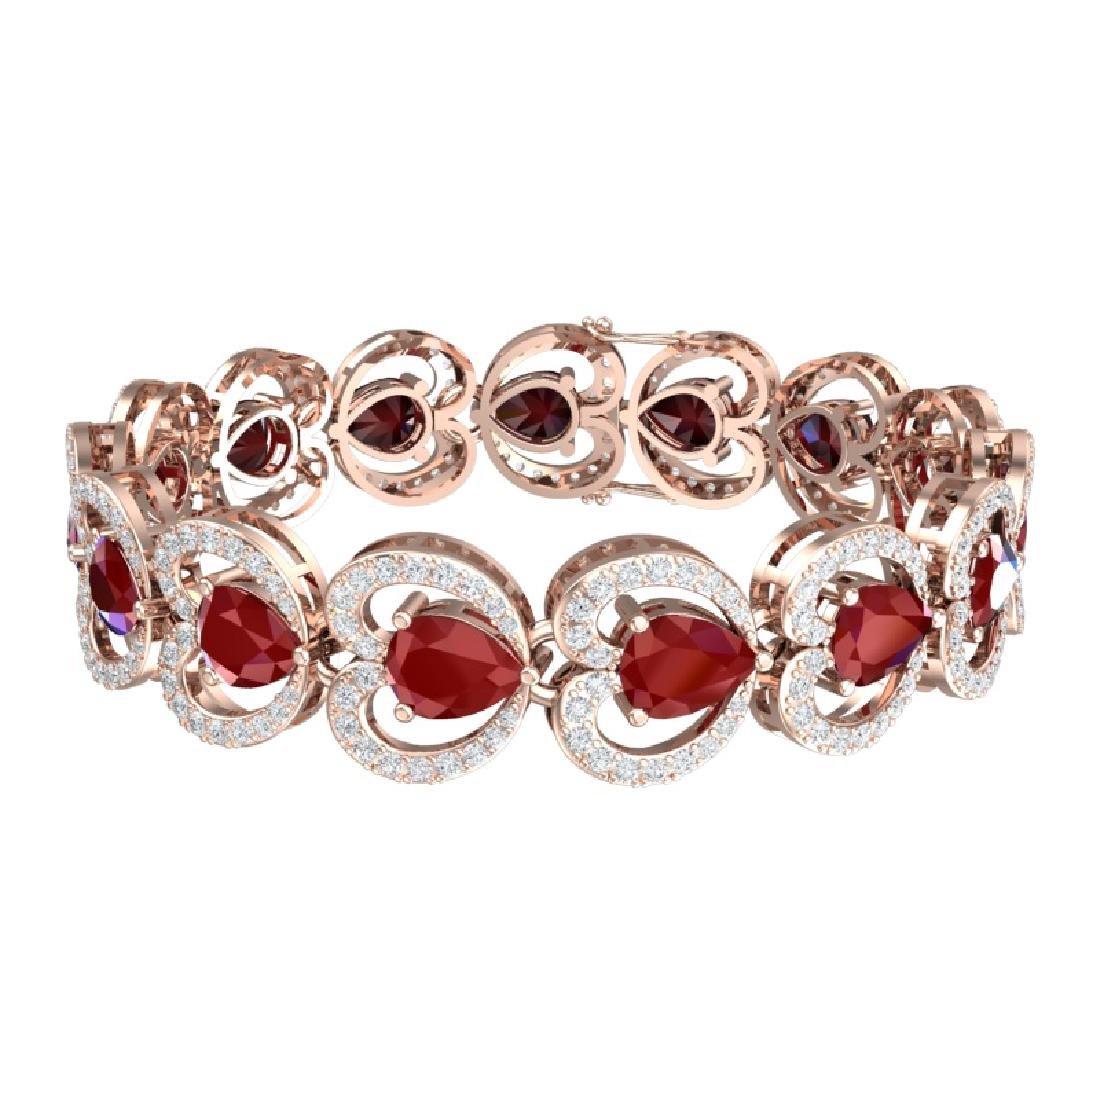 32.15 CTW Royalty Ruby & VS Diamond Bracelet 18K Rose - 3